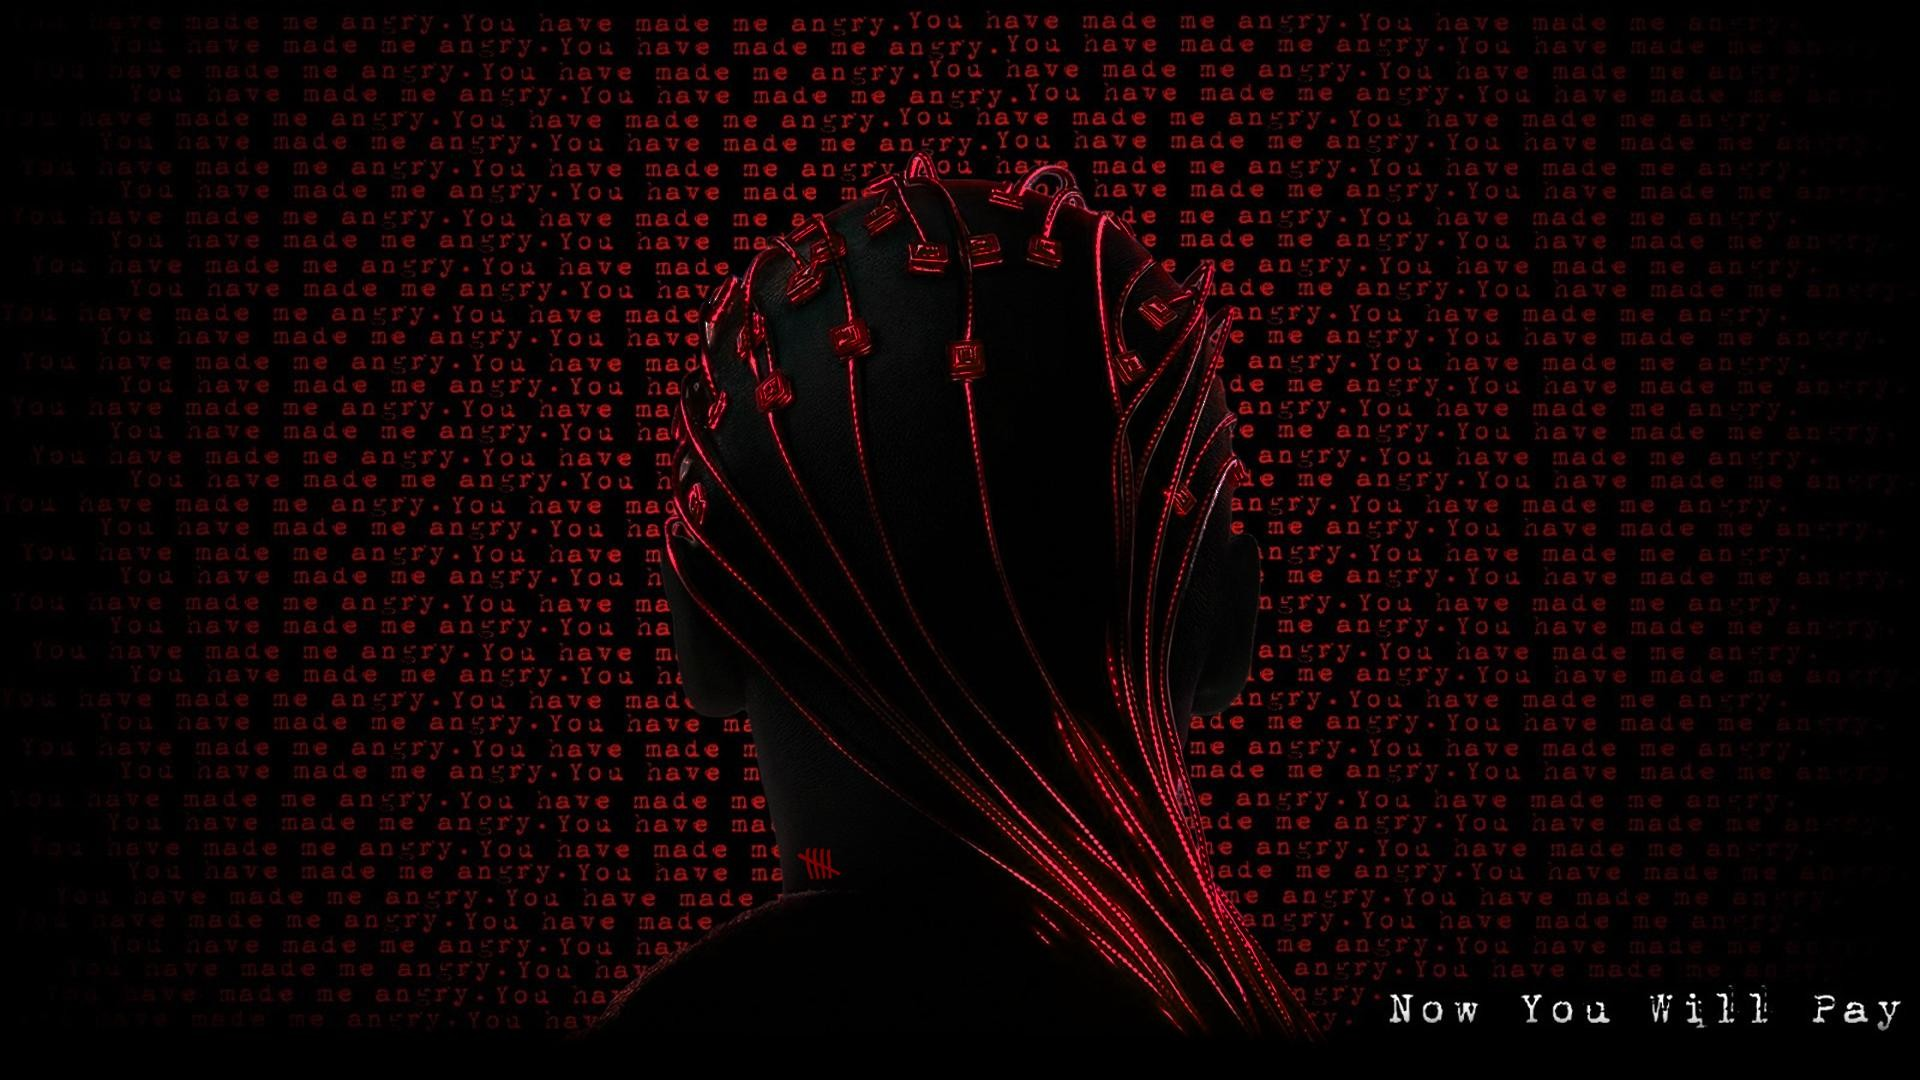 Hacker 4k Wallpapers - Top Free Hacker 4k Backgrounds ...